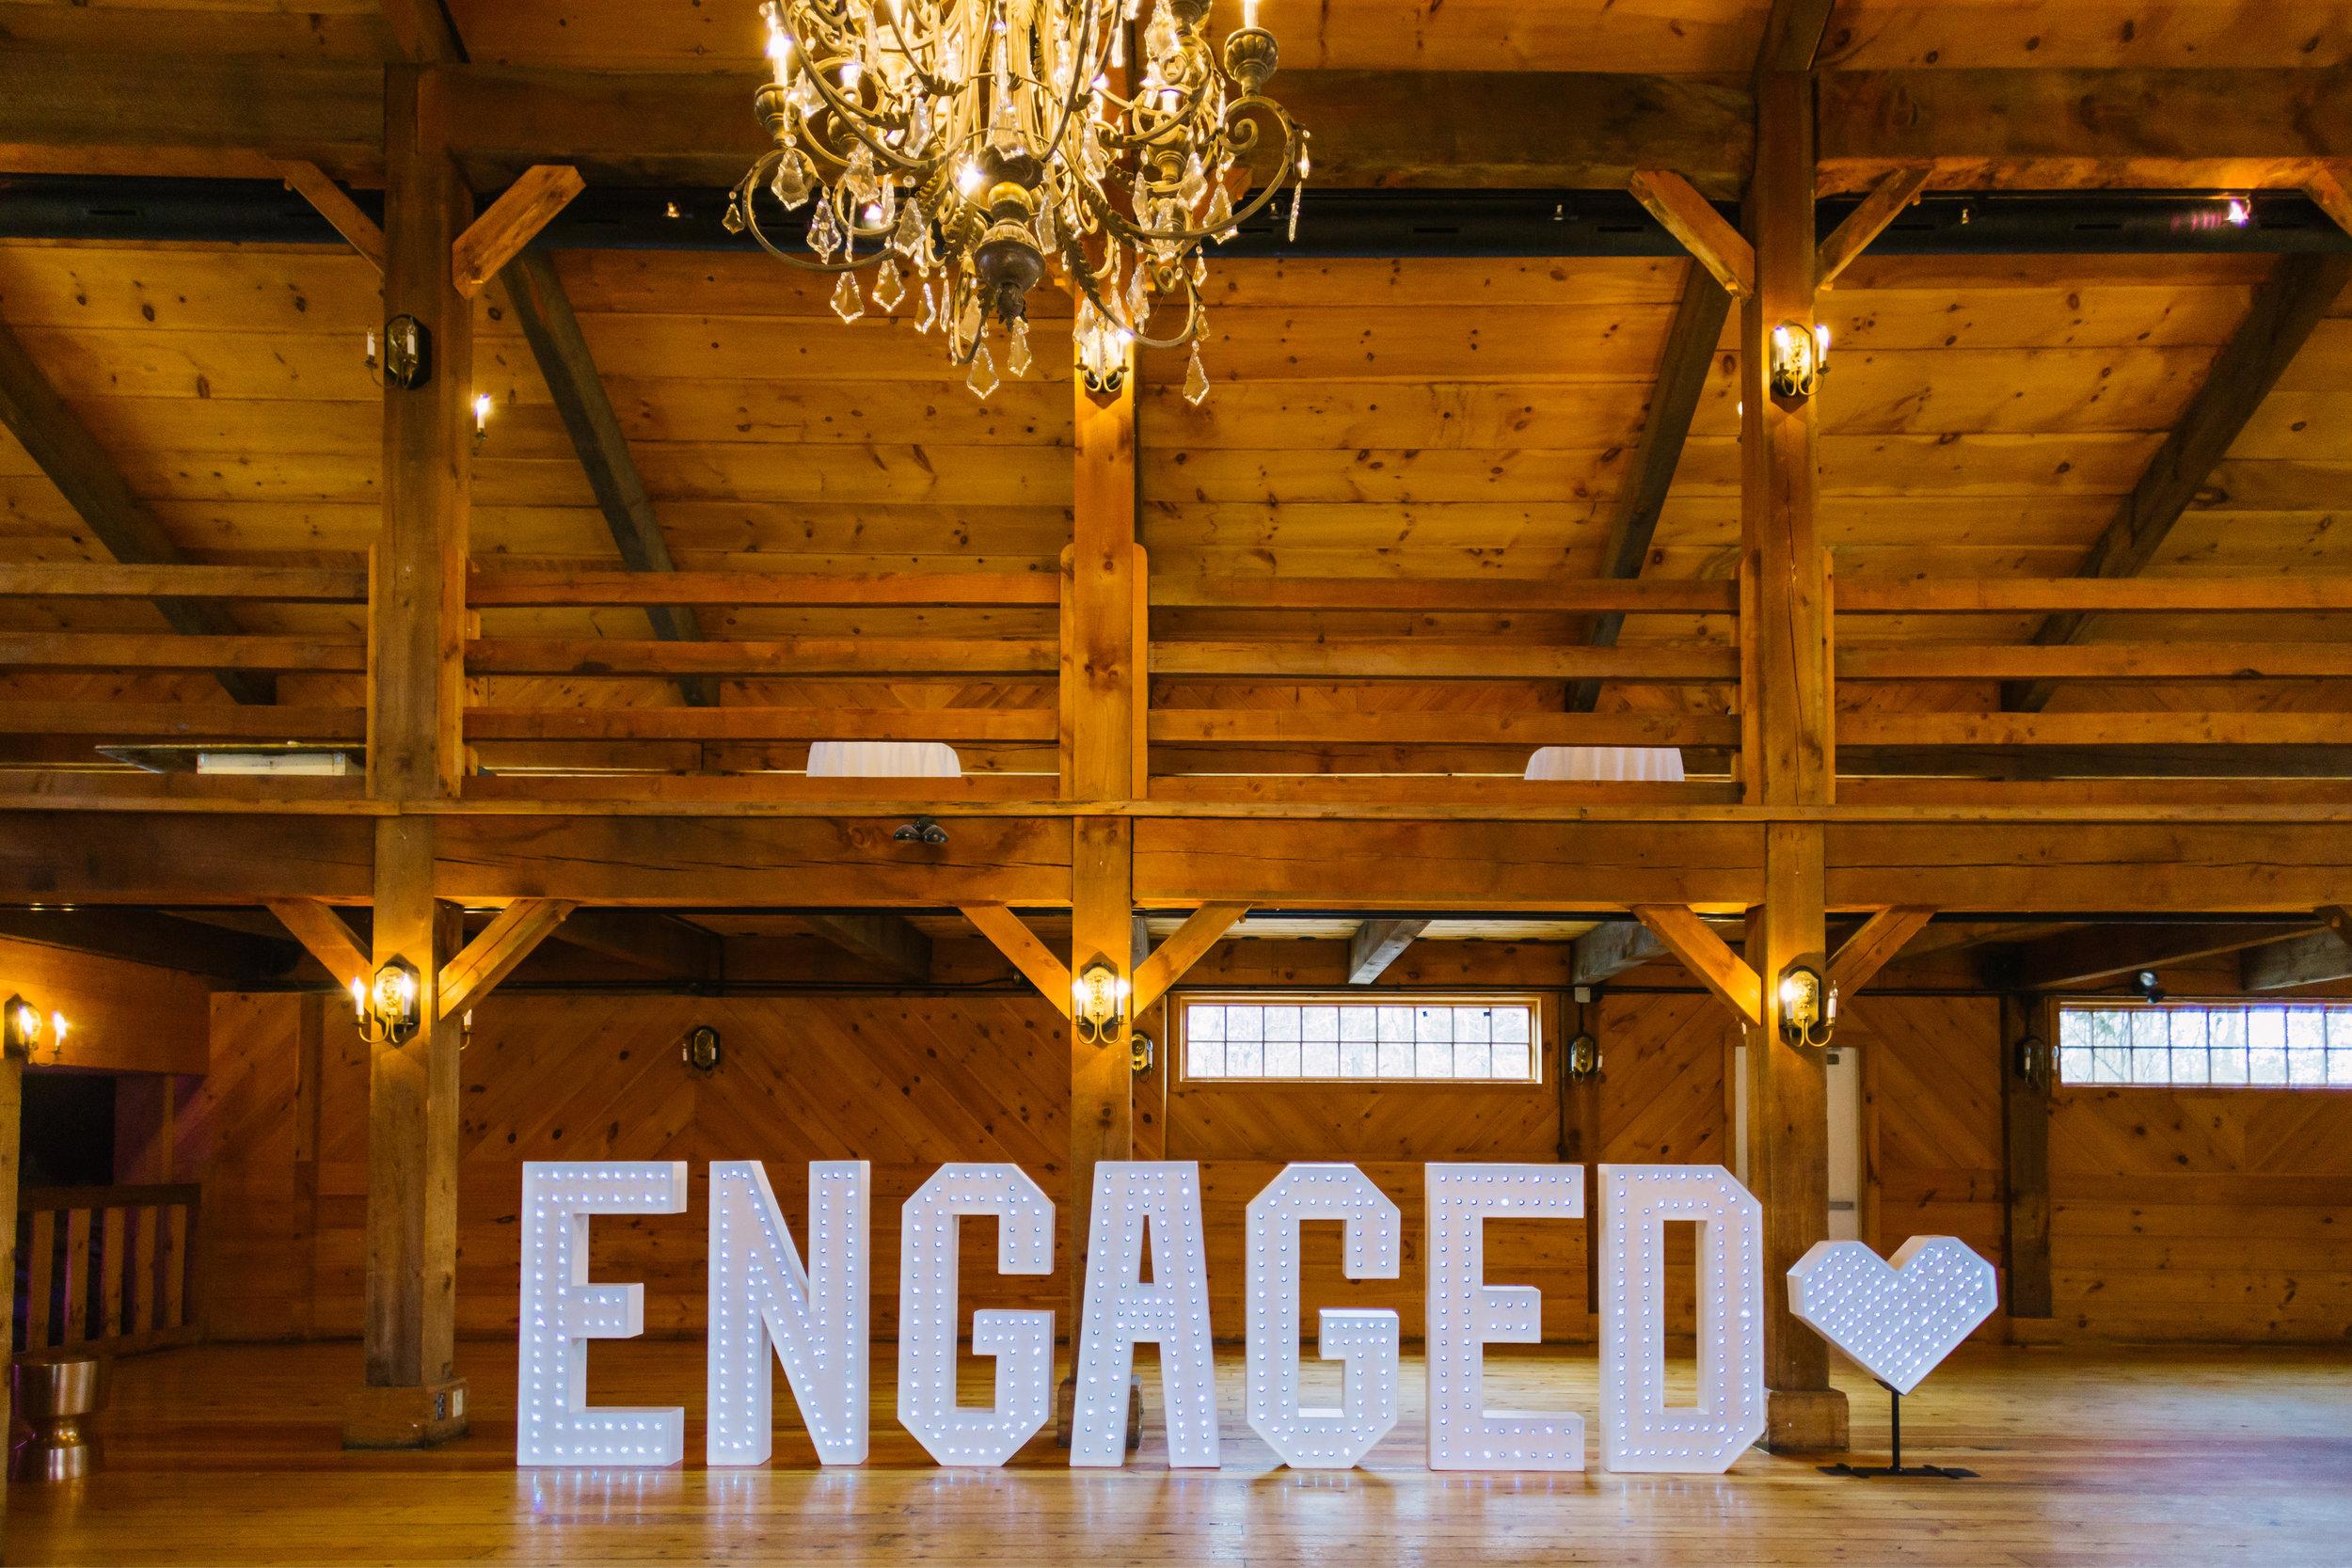 wedding_marquee_letters.jpg